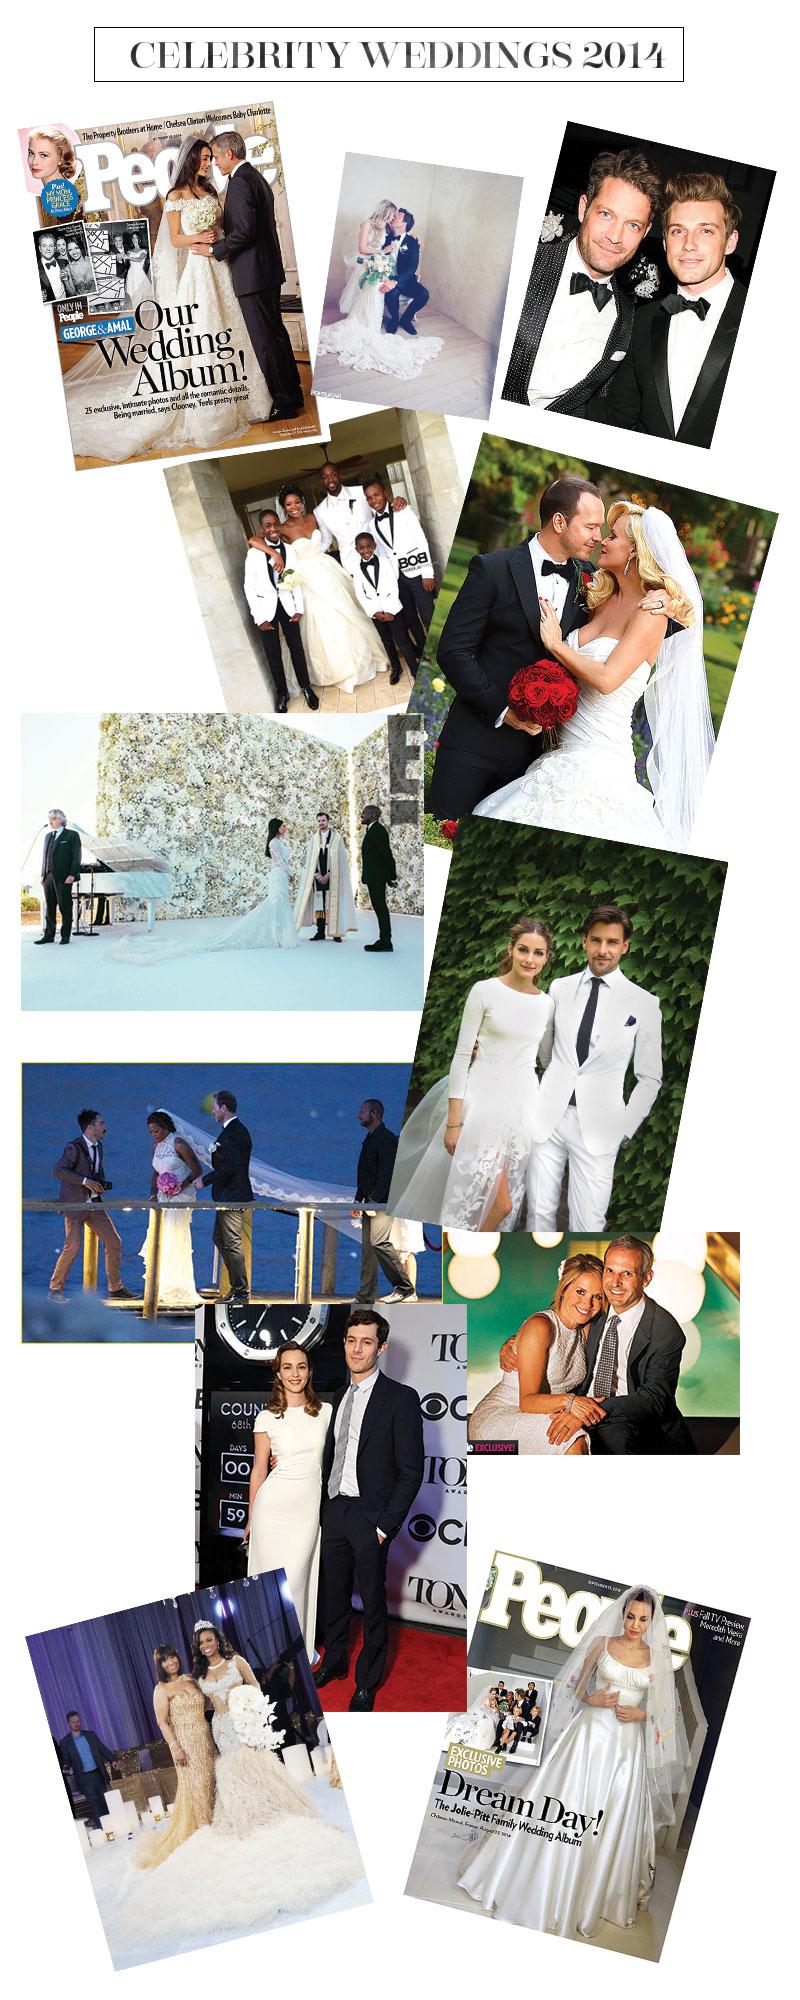 CELEBRITY-WEDDING-2014